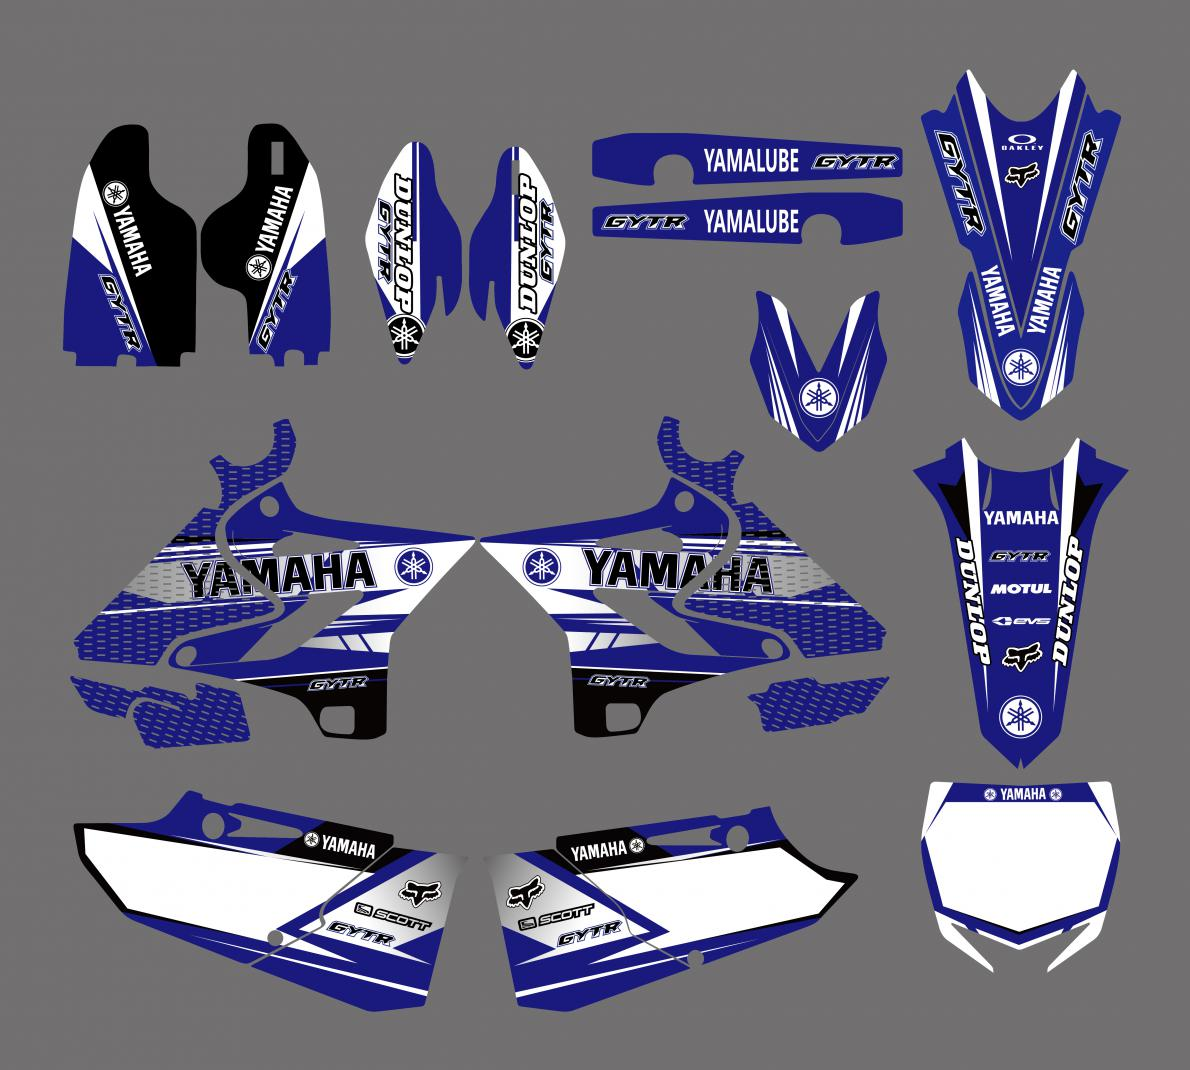 KIT DECO XP YAMAHA YZ 125/250 15-19. Crédits : ©accessoires-moto-enduro-cross.fr 2018